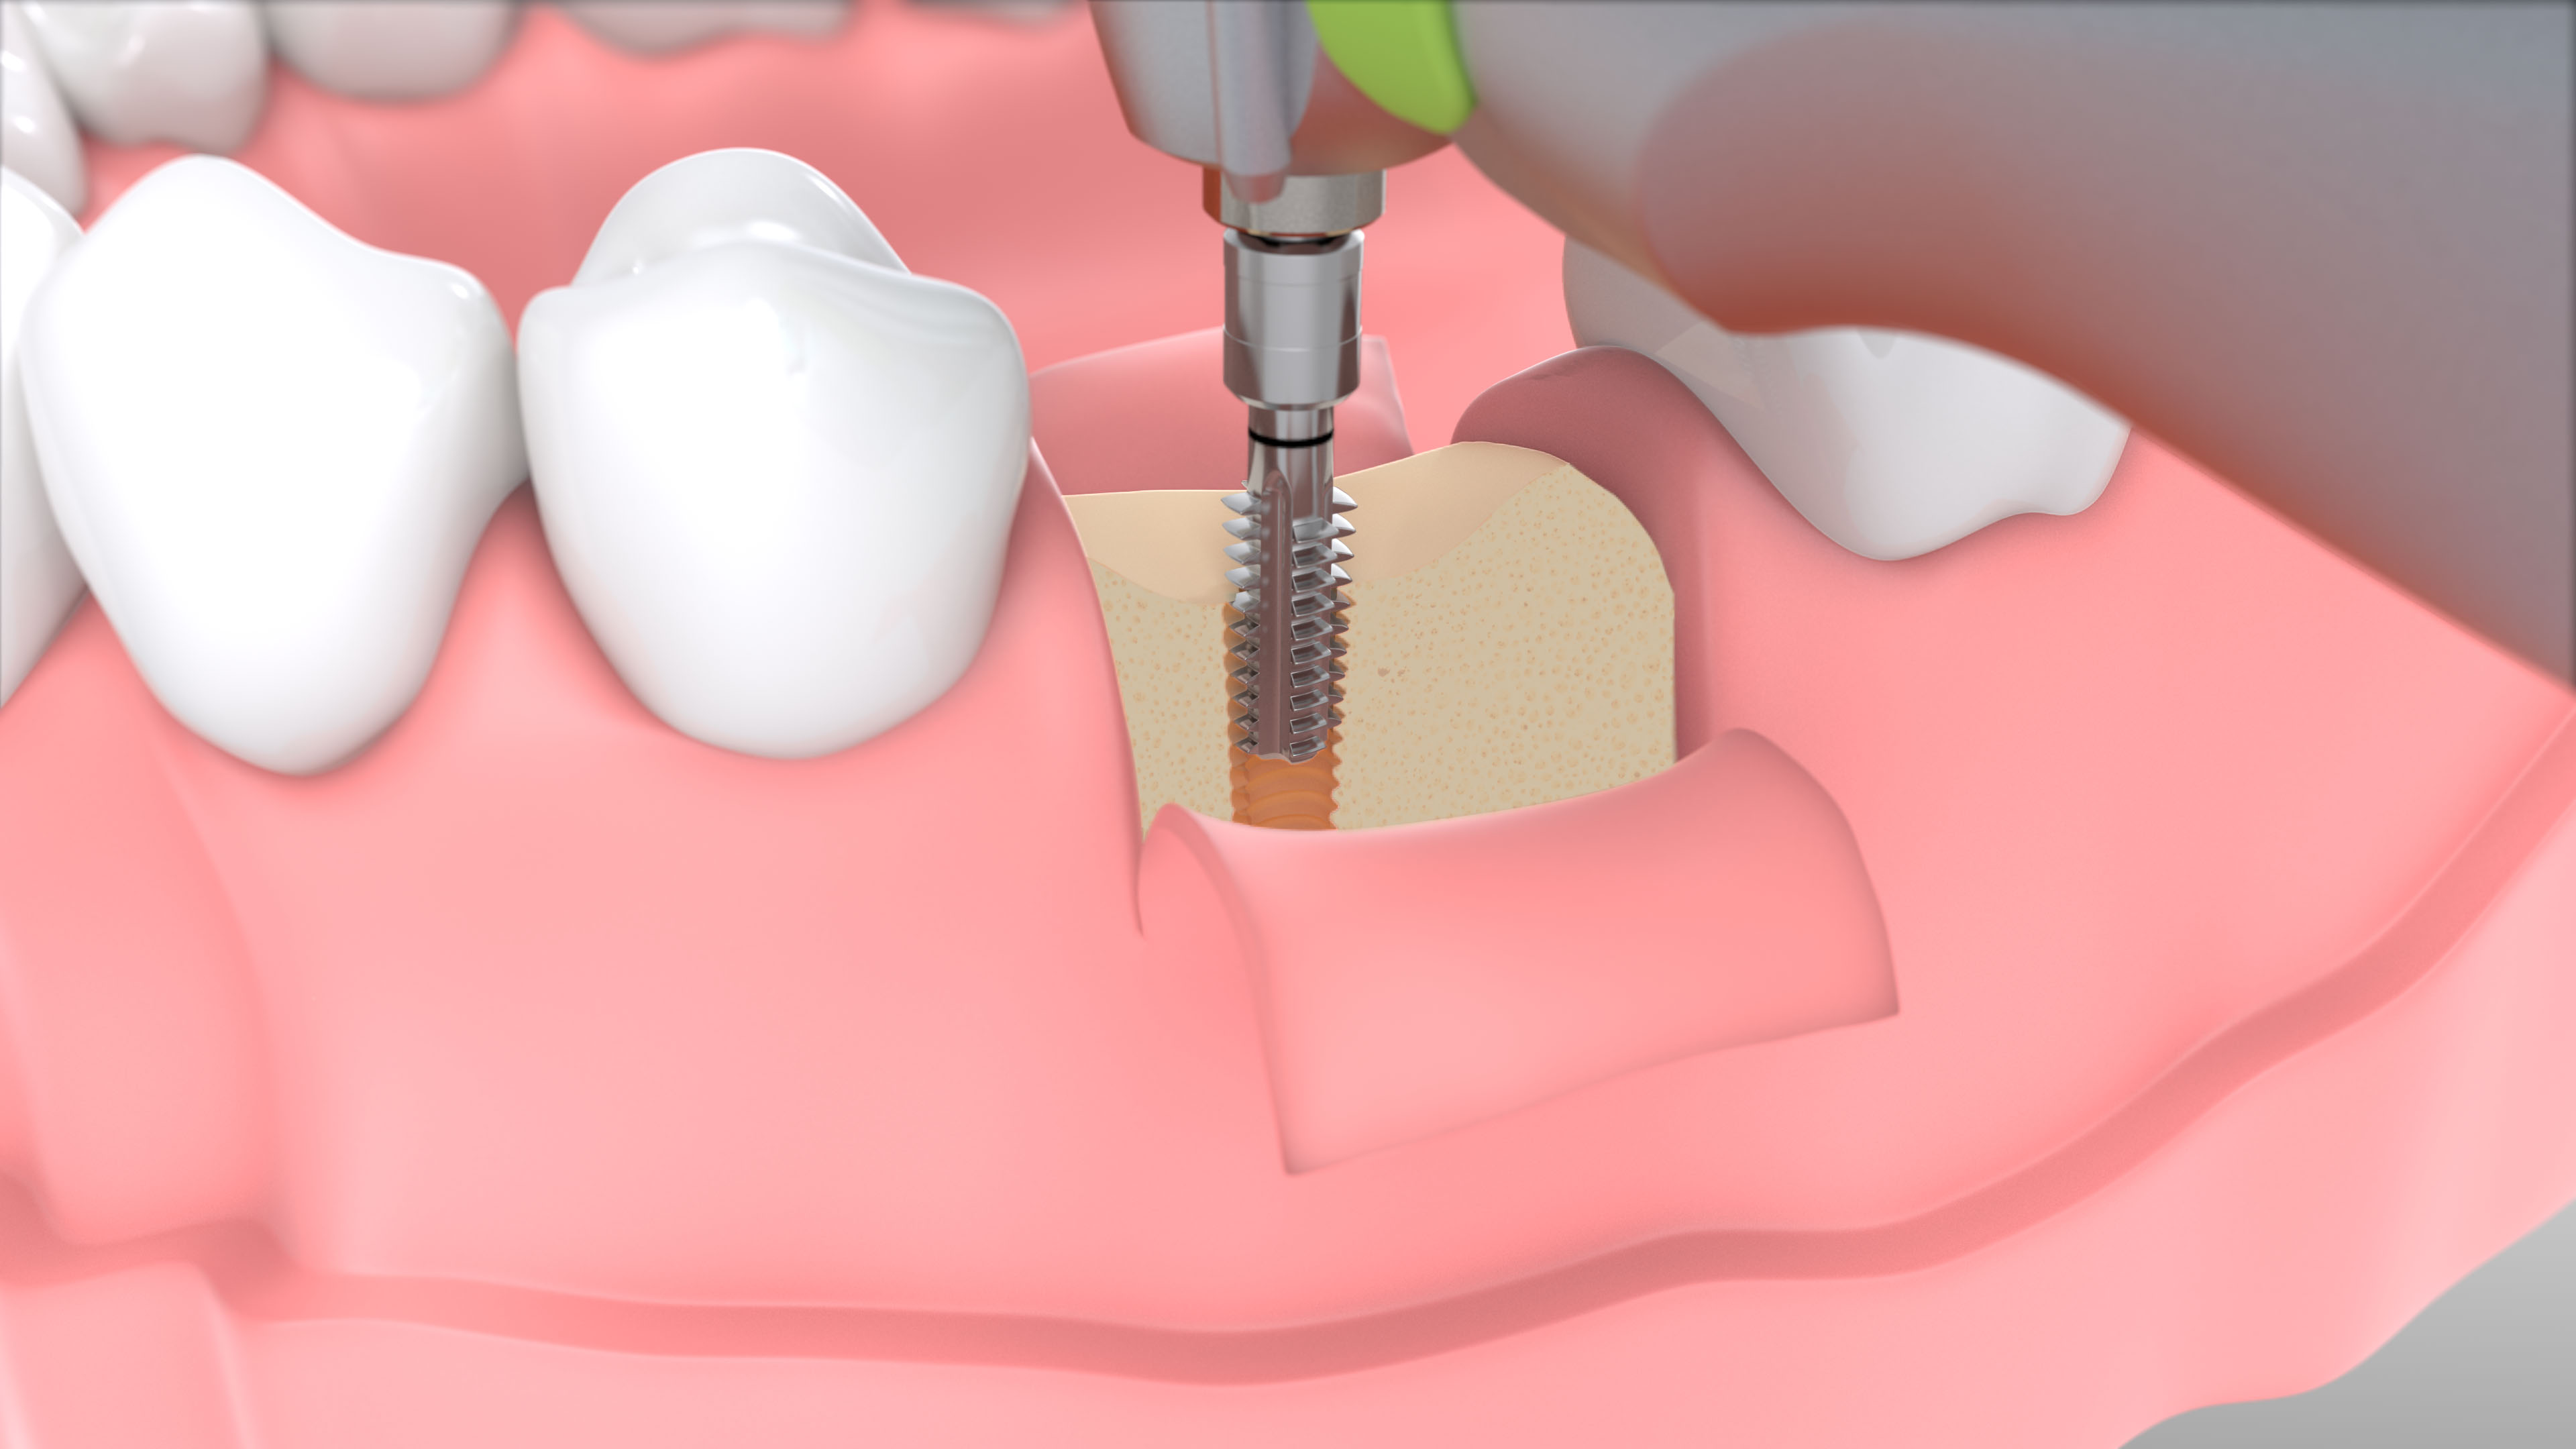 W&H Implantmed Thread Cutter